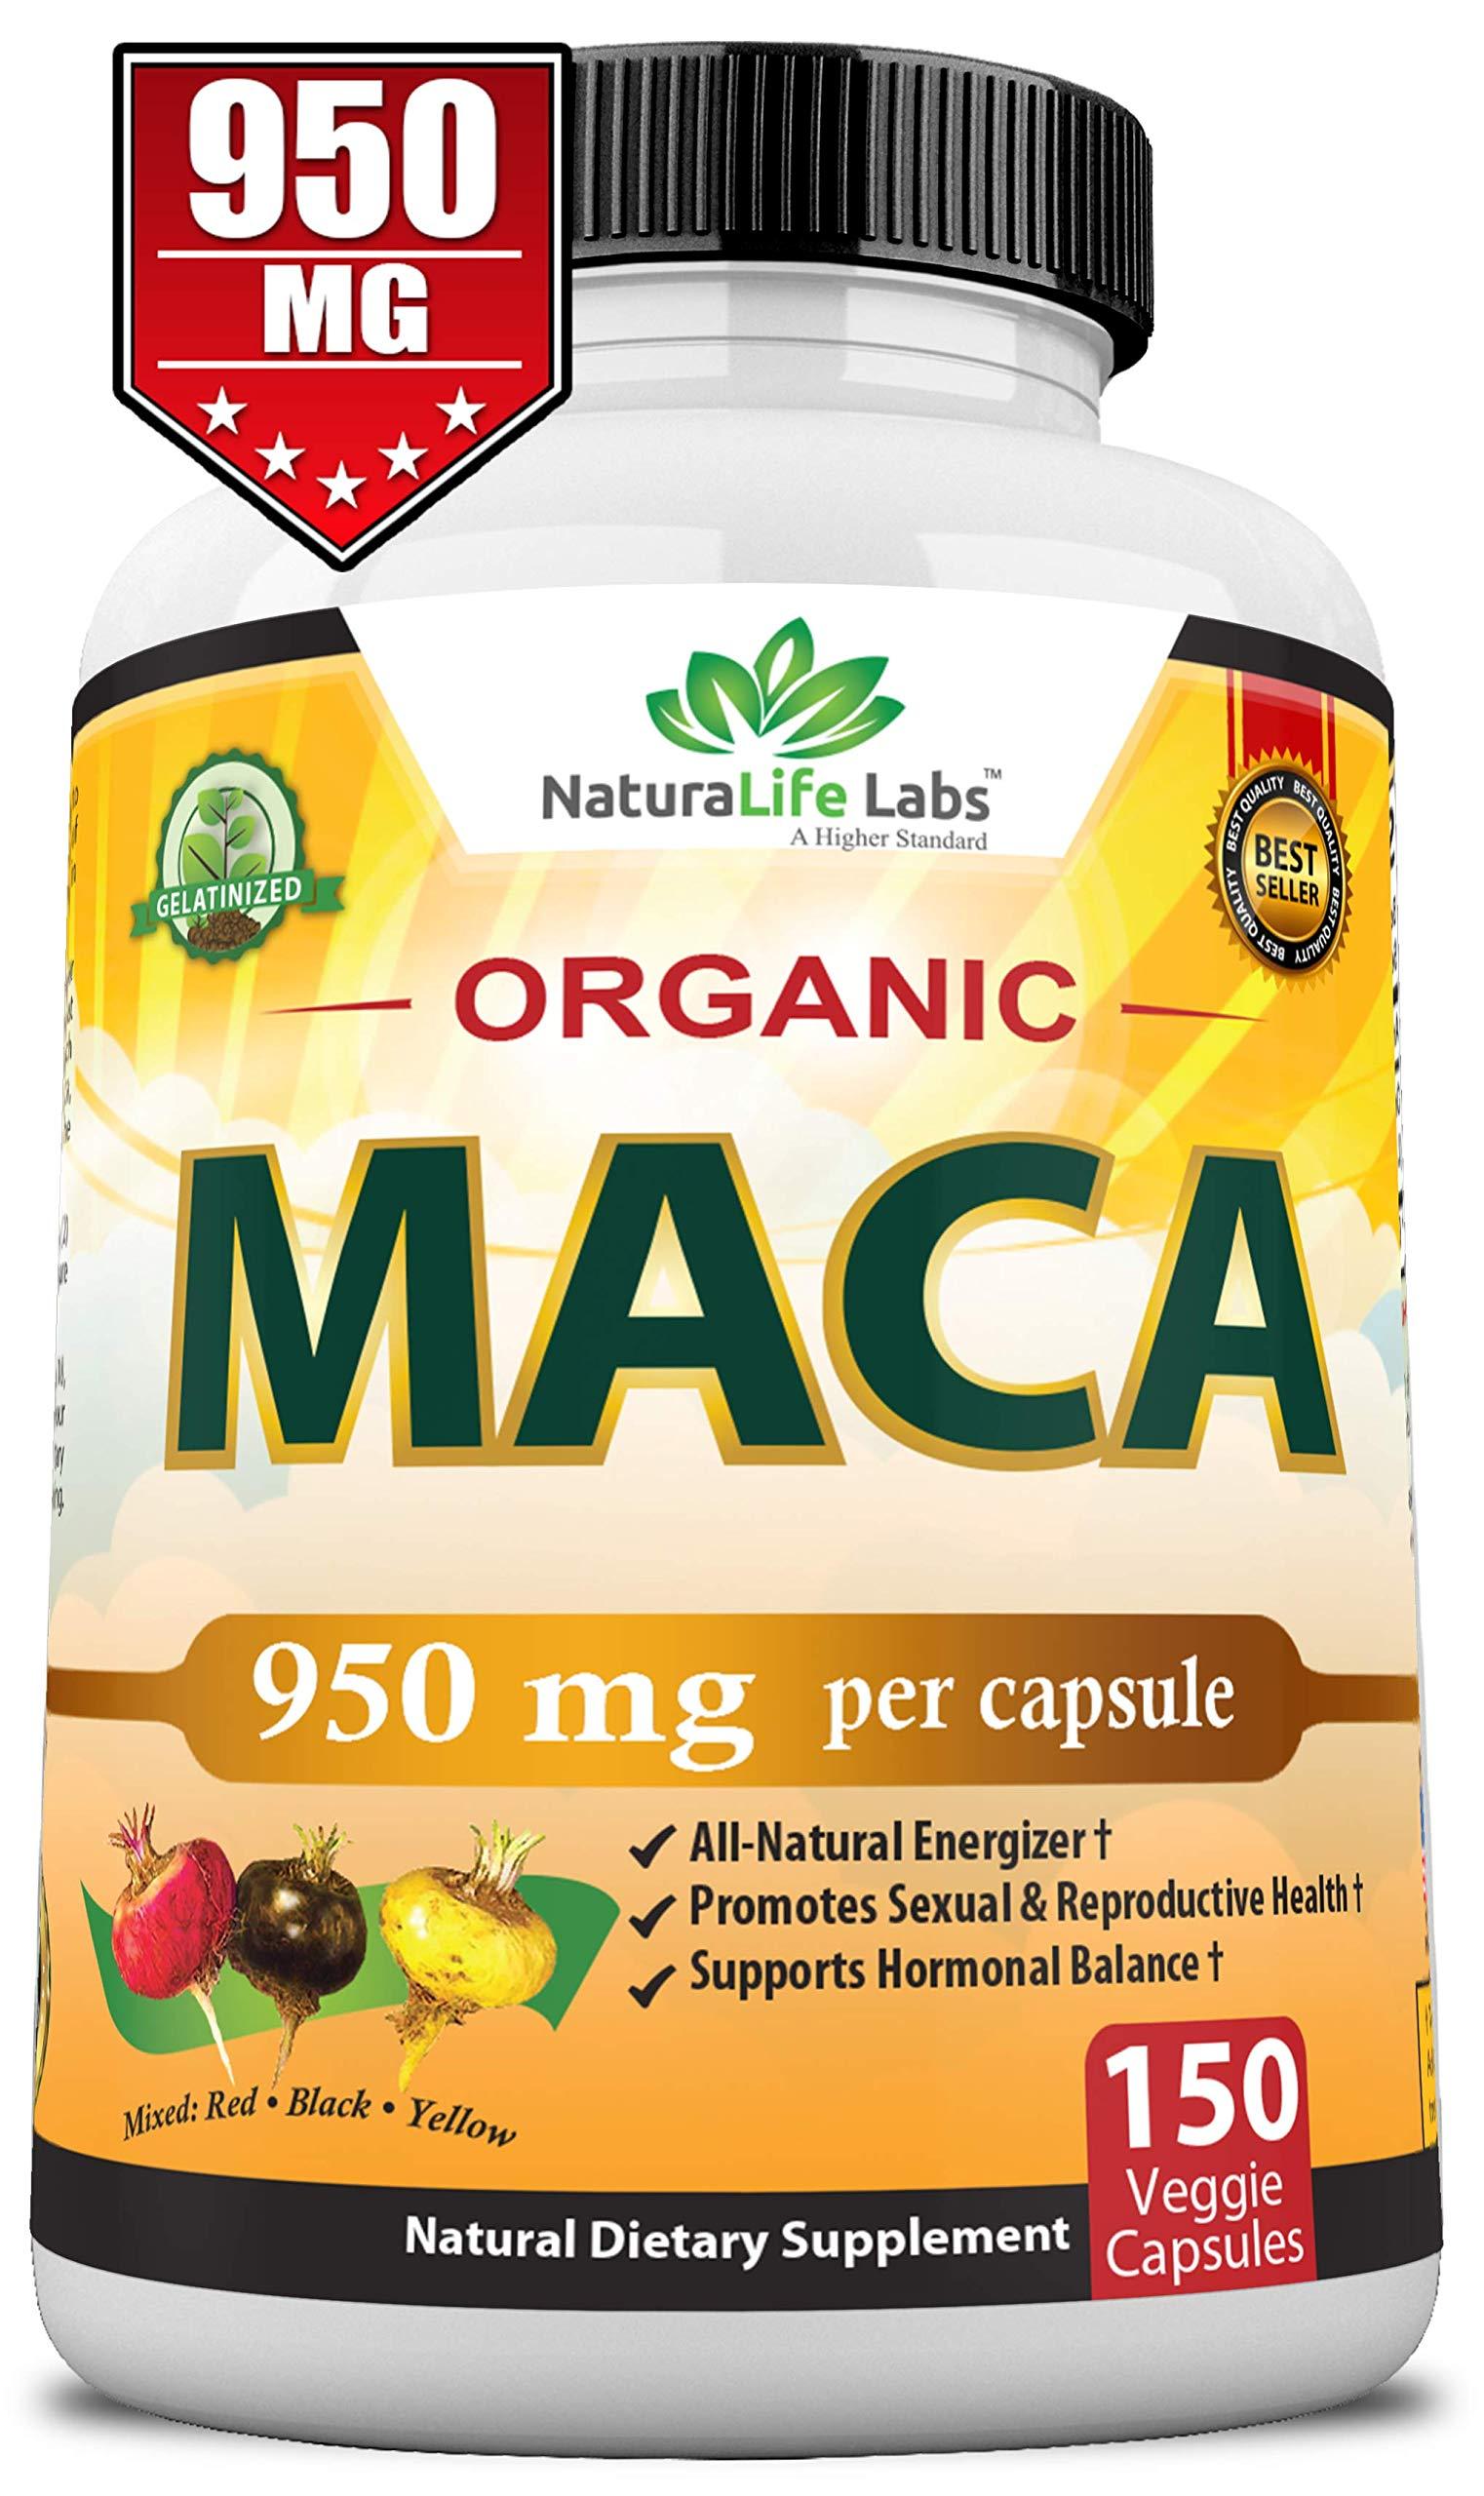 Organic Maca Root Black, Red, Yellow 950MG per capsule 150 vegan capsules Peruvian Maca Root Gelatinized 100% Pure Non-GMO supports Reproductive Health Natural Energizer by NaturaLife Labs